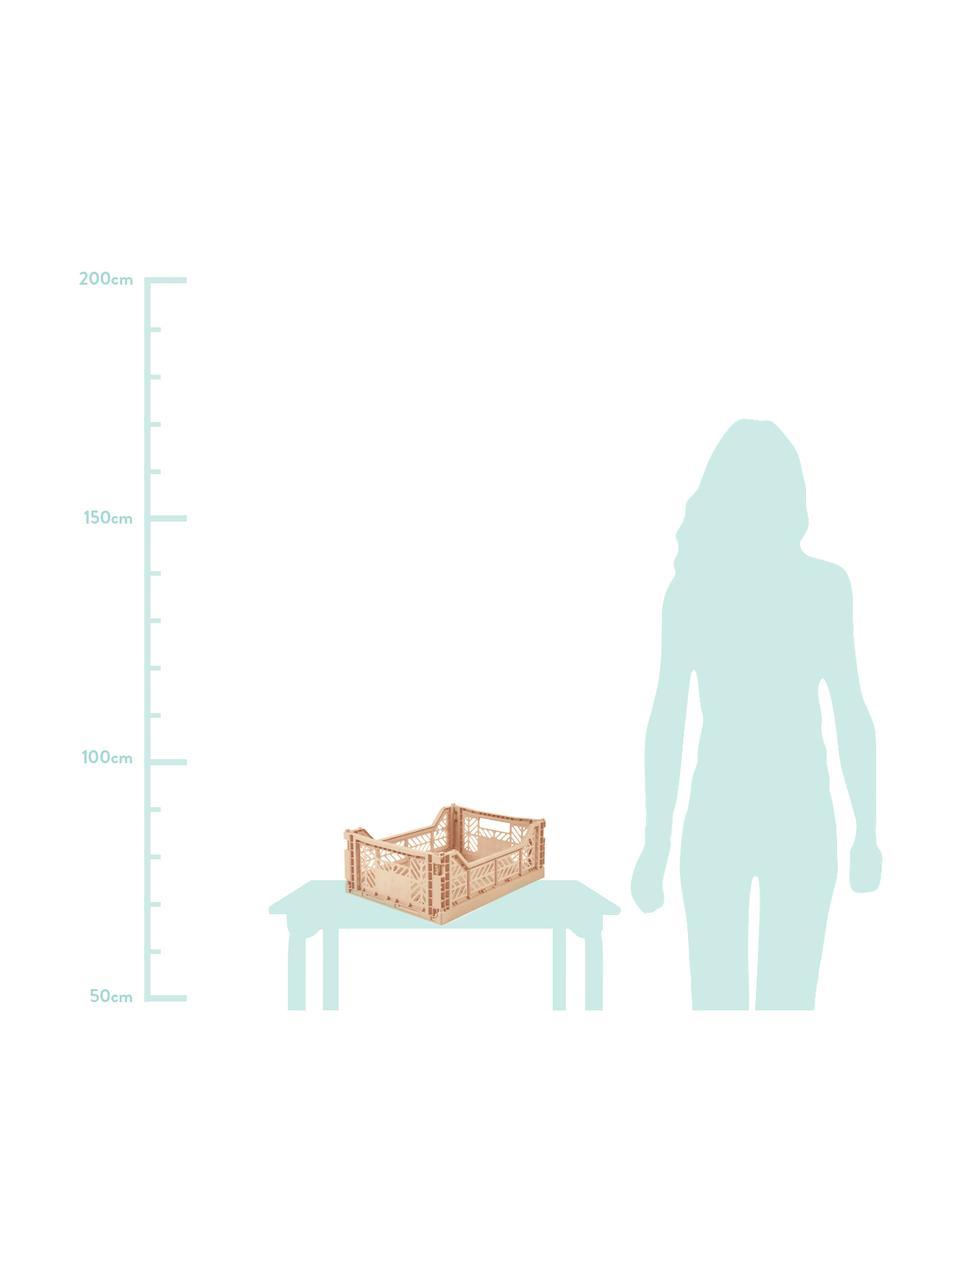 Klappkiste Milk Tea, stapelbar, medium, Recycelter Kunststoff, Beige, 40 x 14 cm